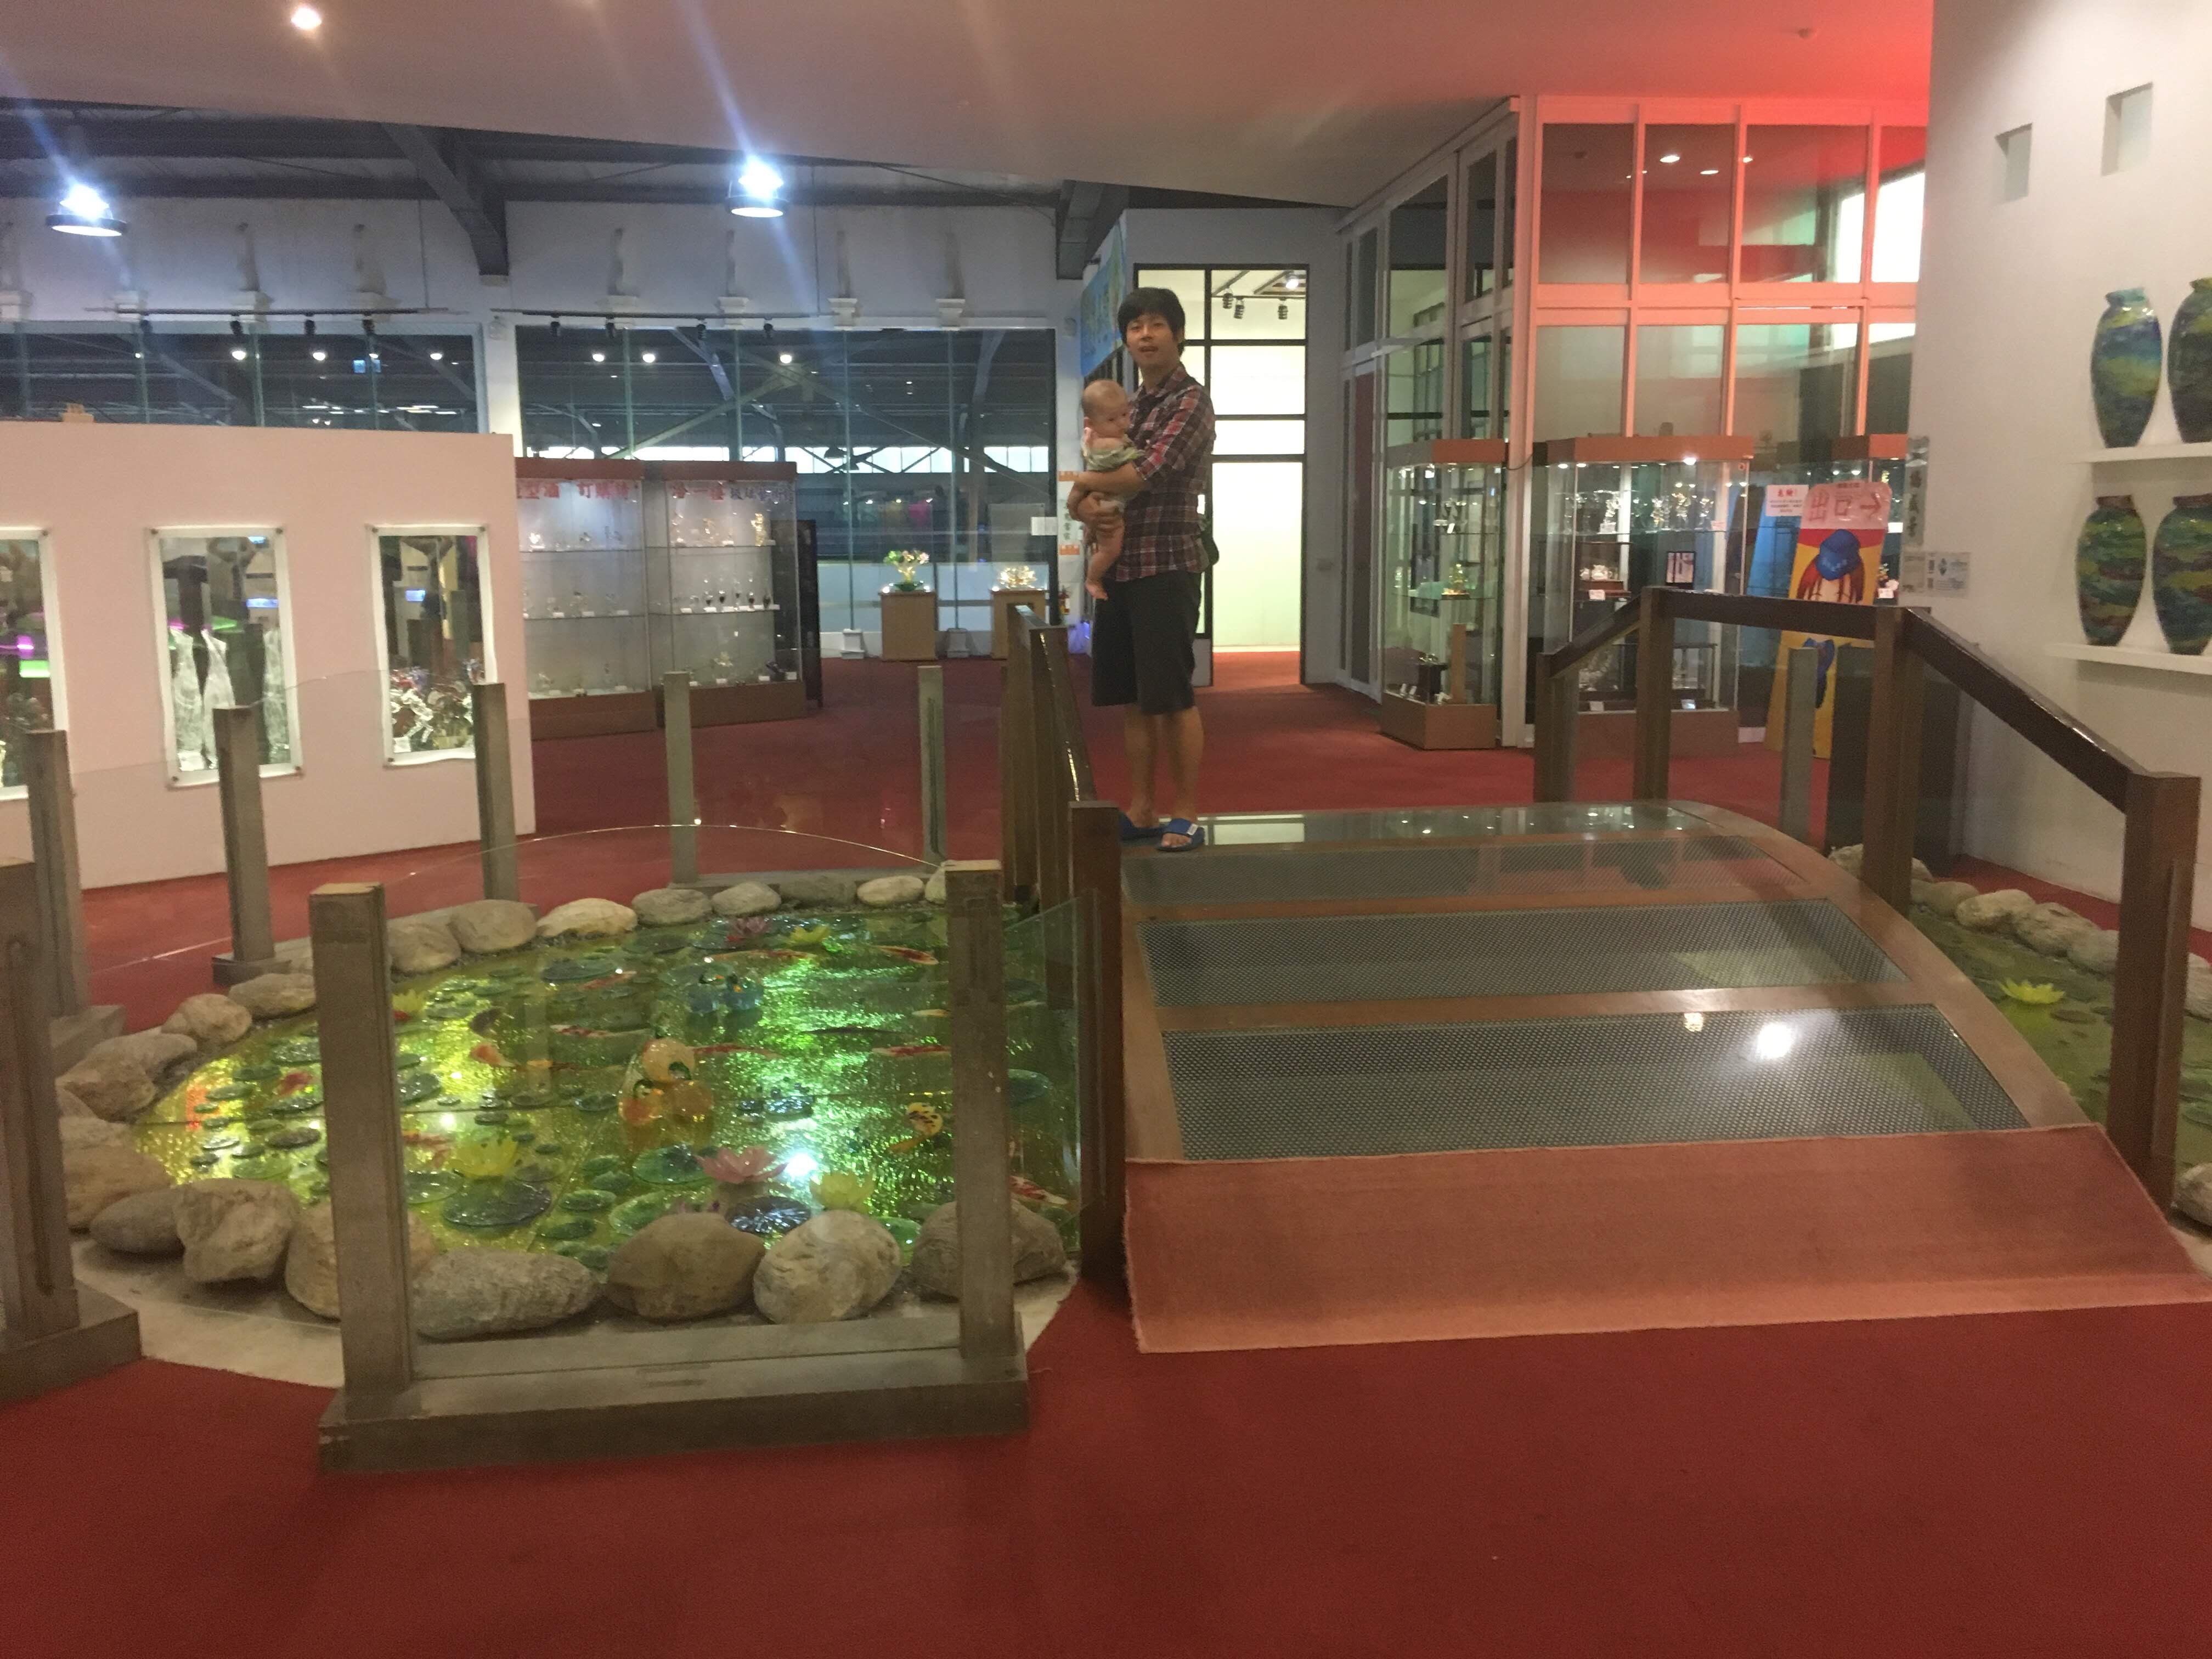 lukang changhua Taiwan glass gallery glass temple amwf couple